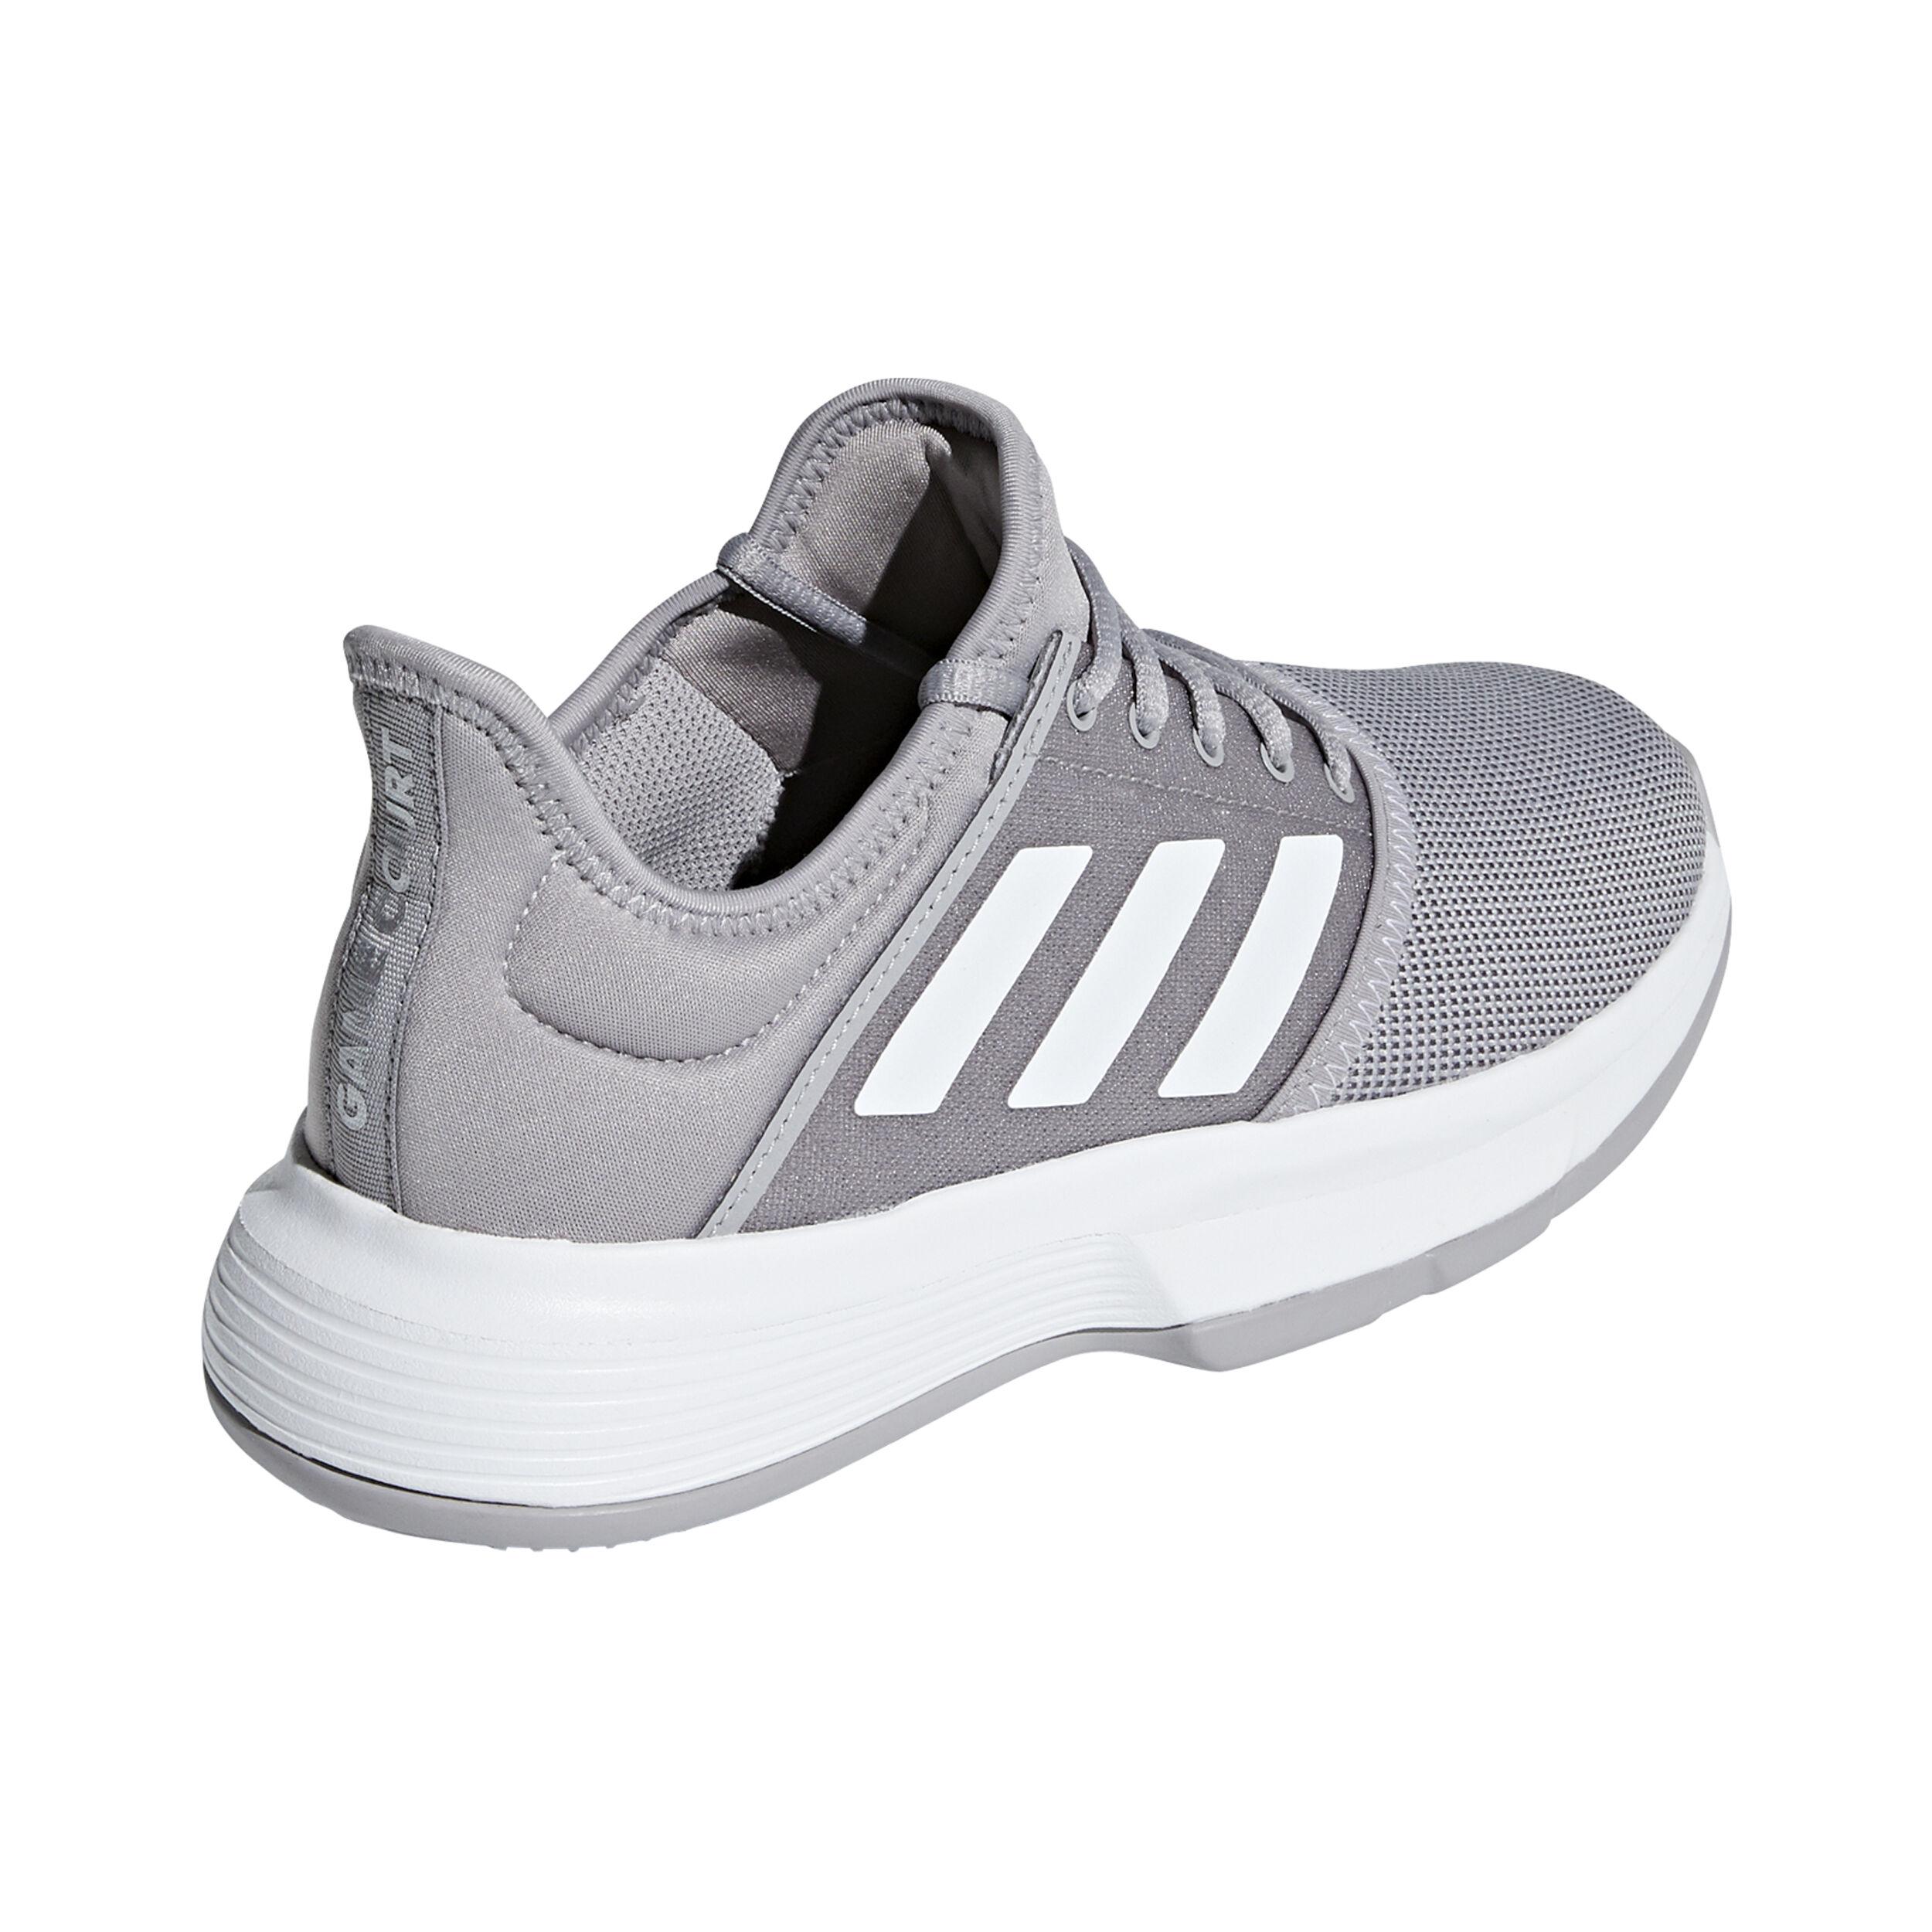 adidas Game Court Allcourtschuh Damen - Hellgrau, Grau ...